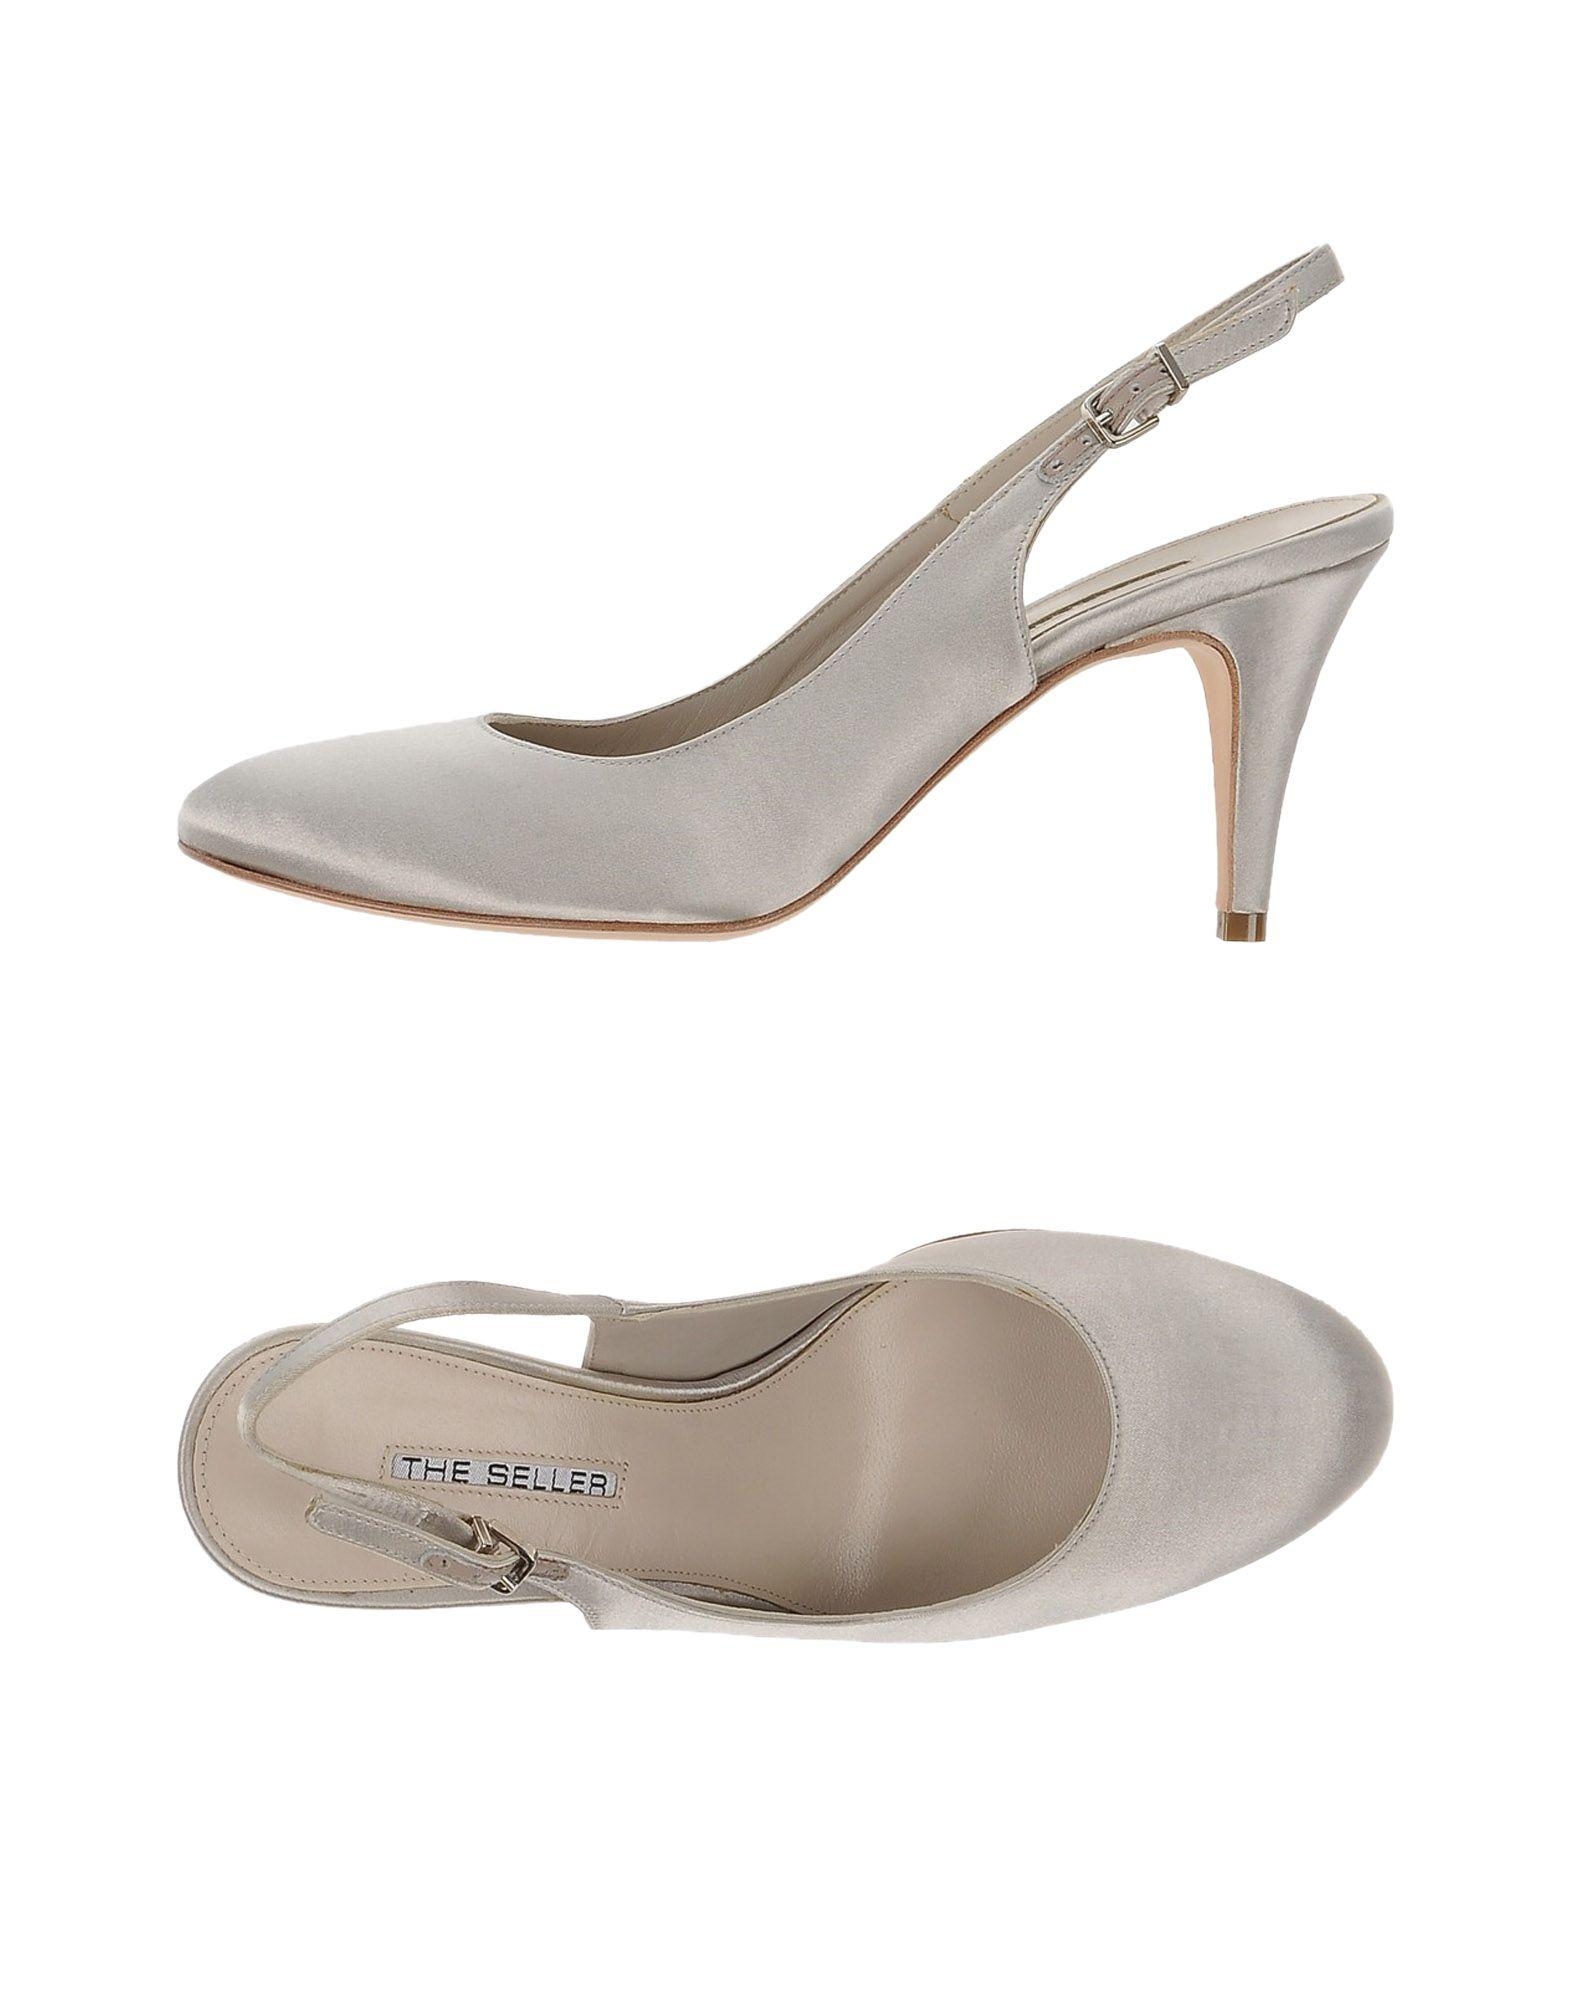 THE SELLER Туфли цены онлайн